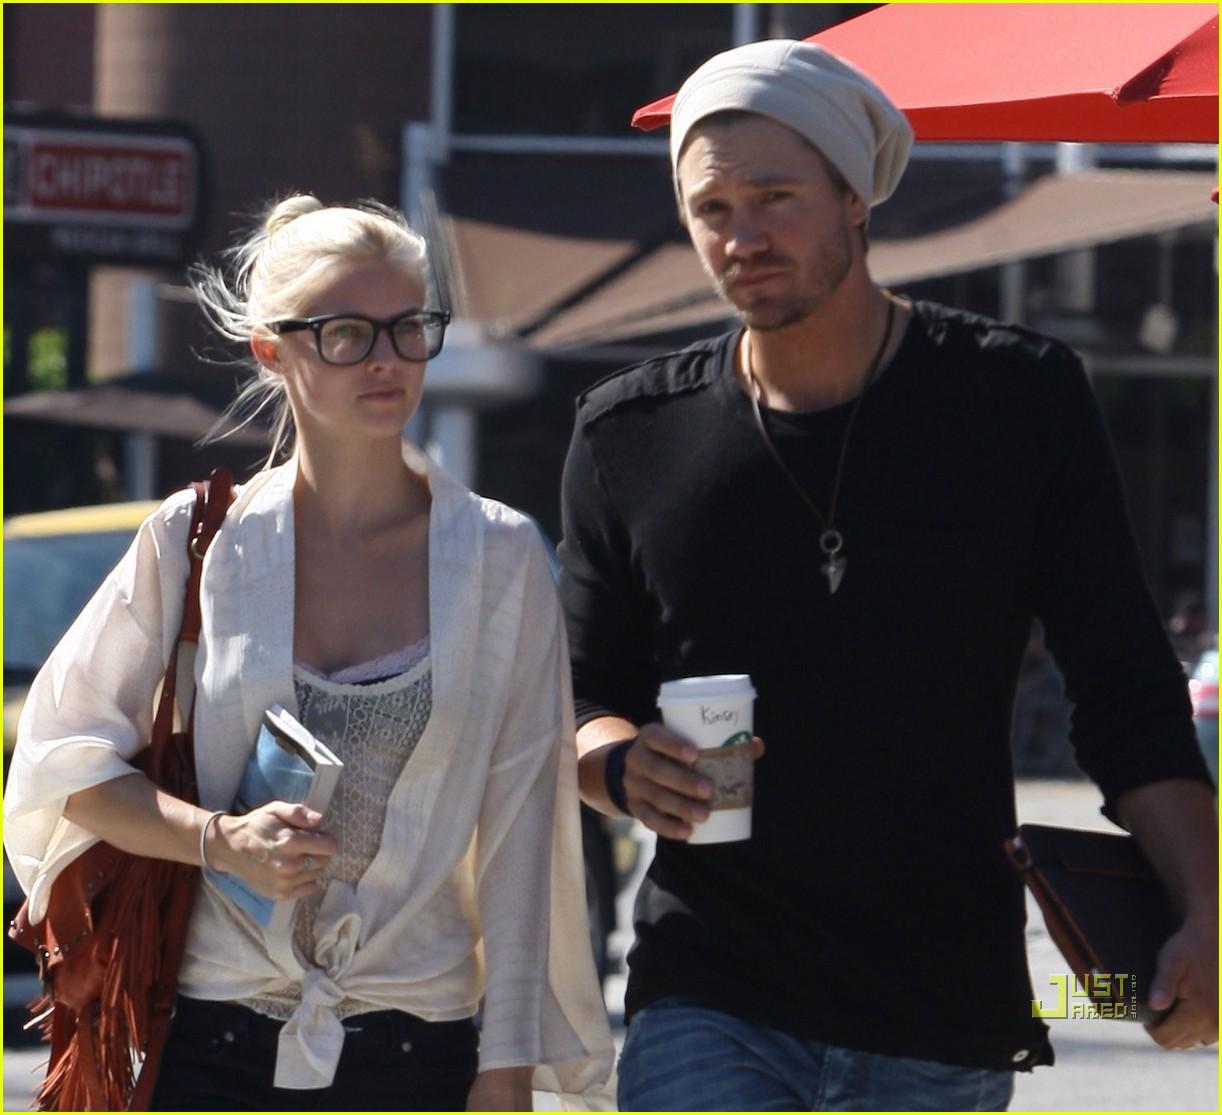 Chad Murray & Kenzie Dalton: Starbucks Stop - chad-michael-murray photo